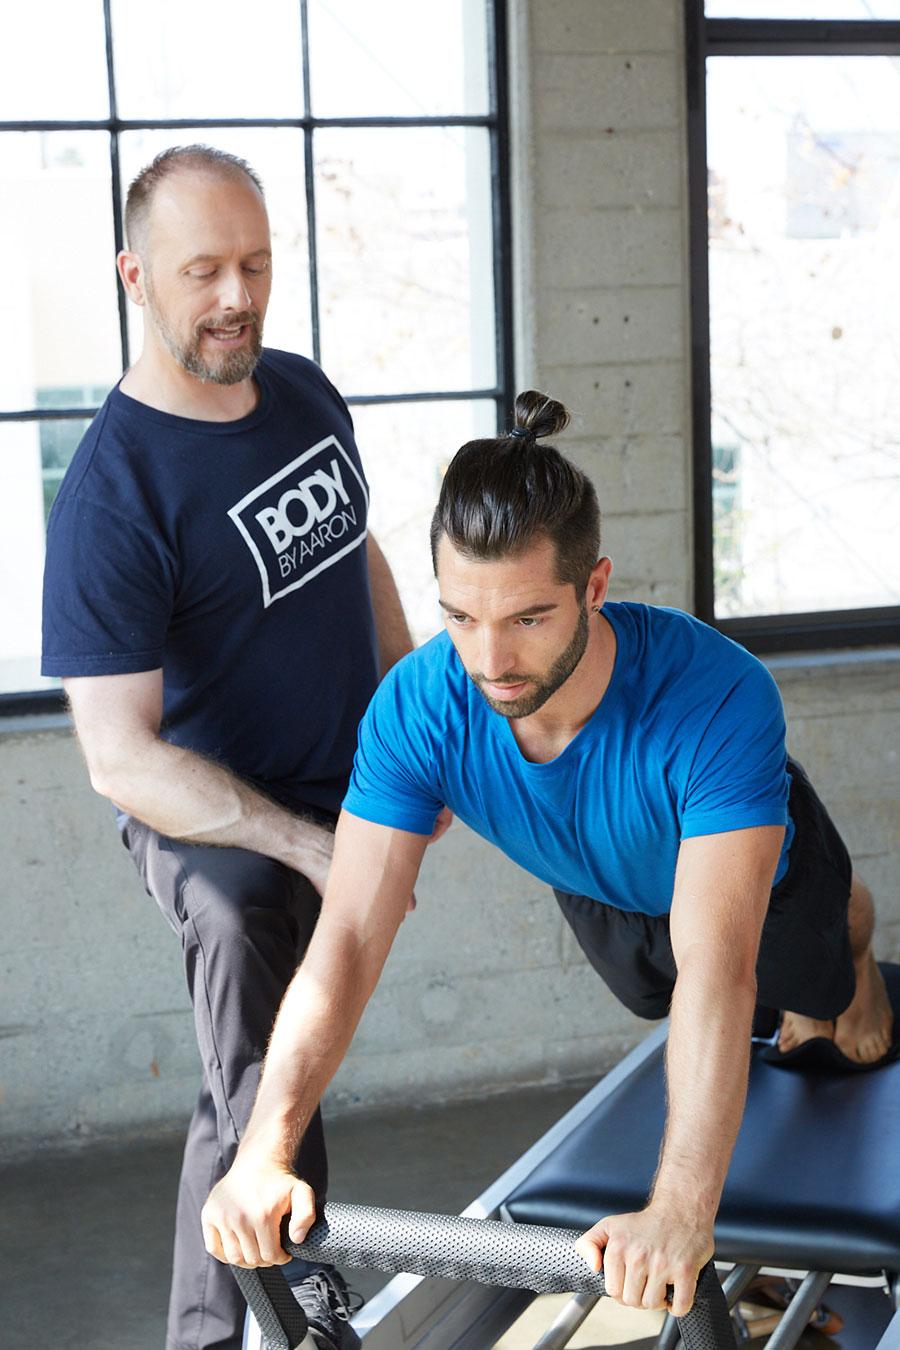 Pilates Man on Reformer